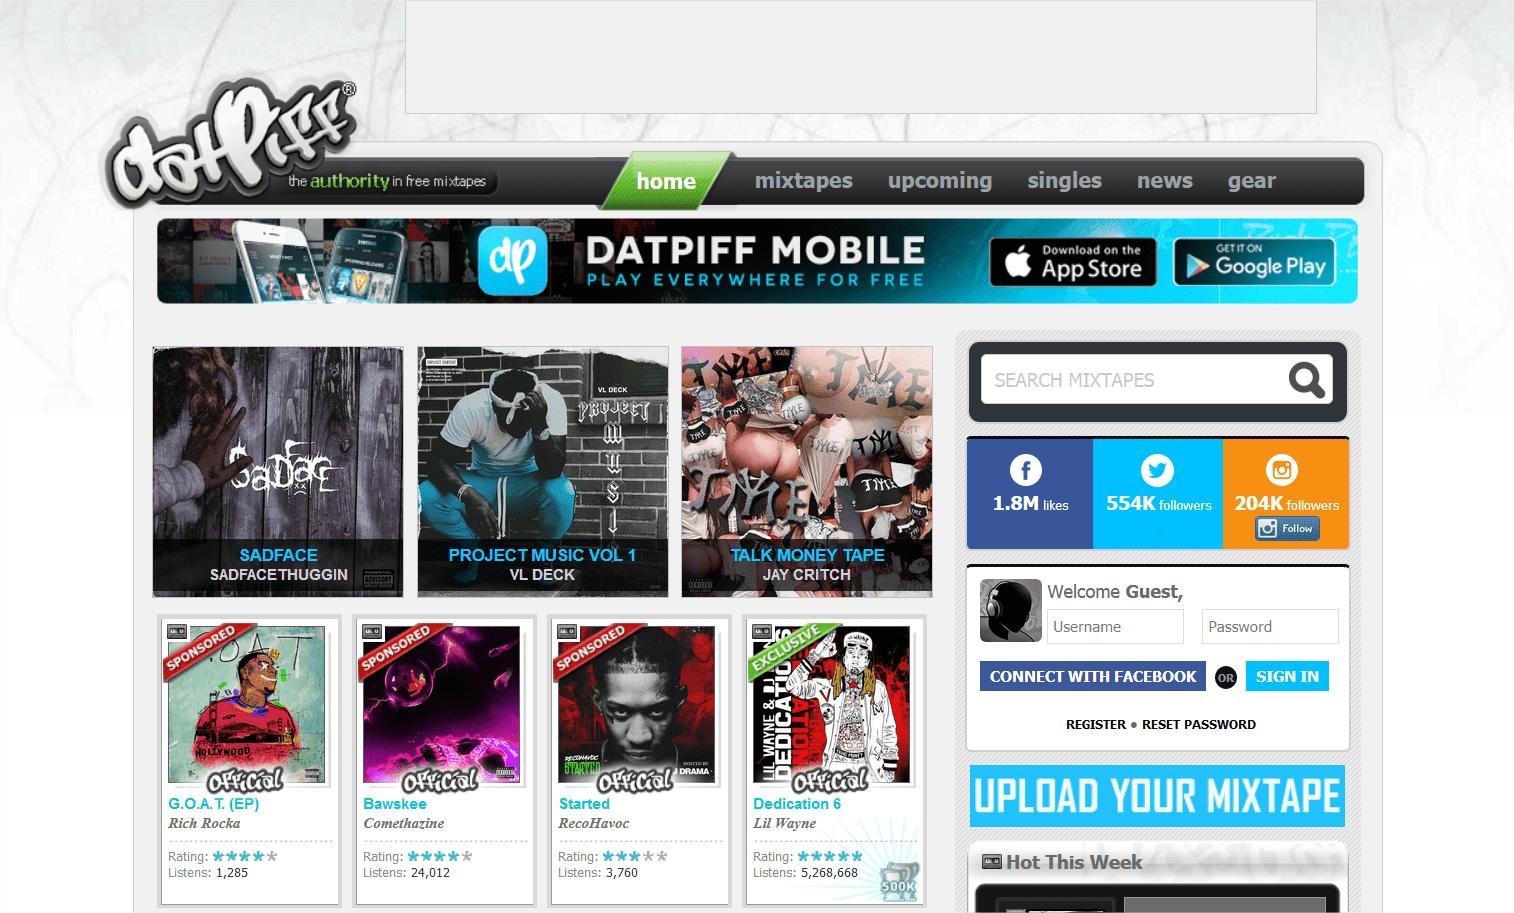 Descubra 25 sites para download de musica gratis legalmente 26